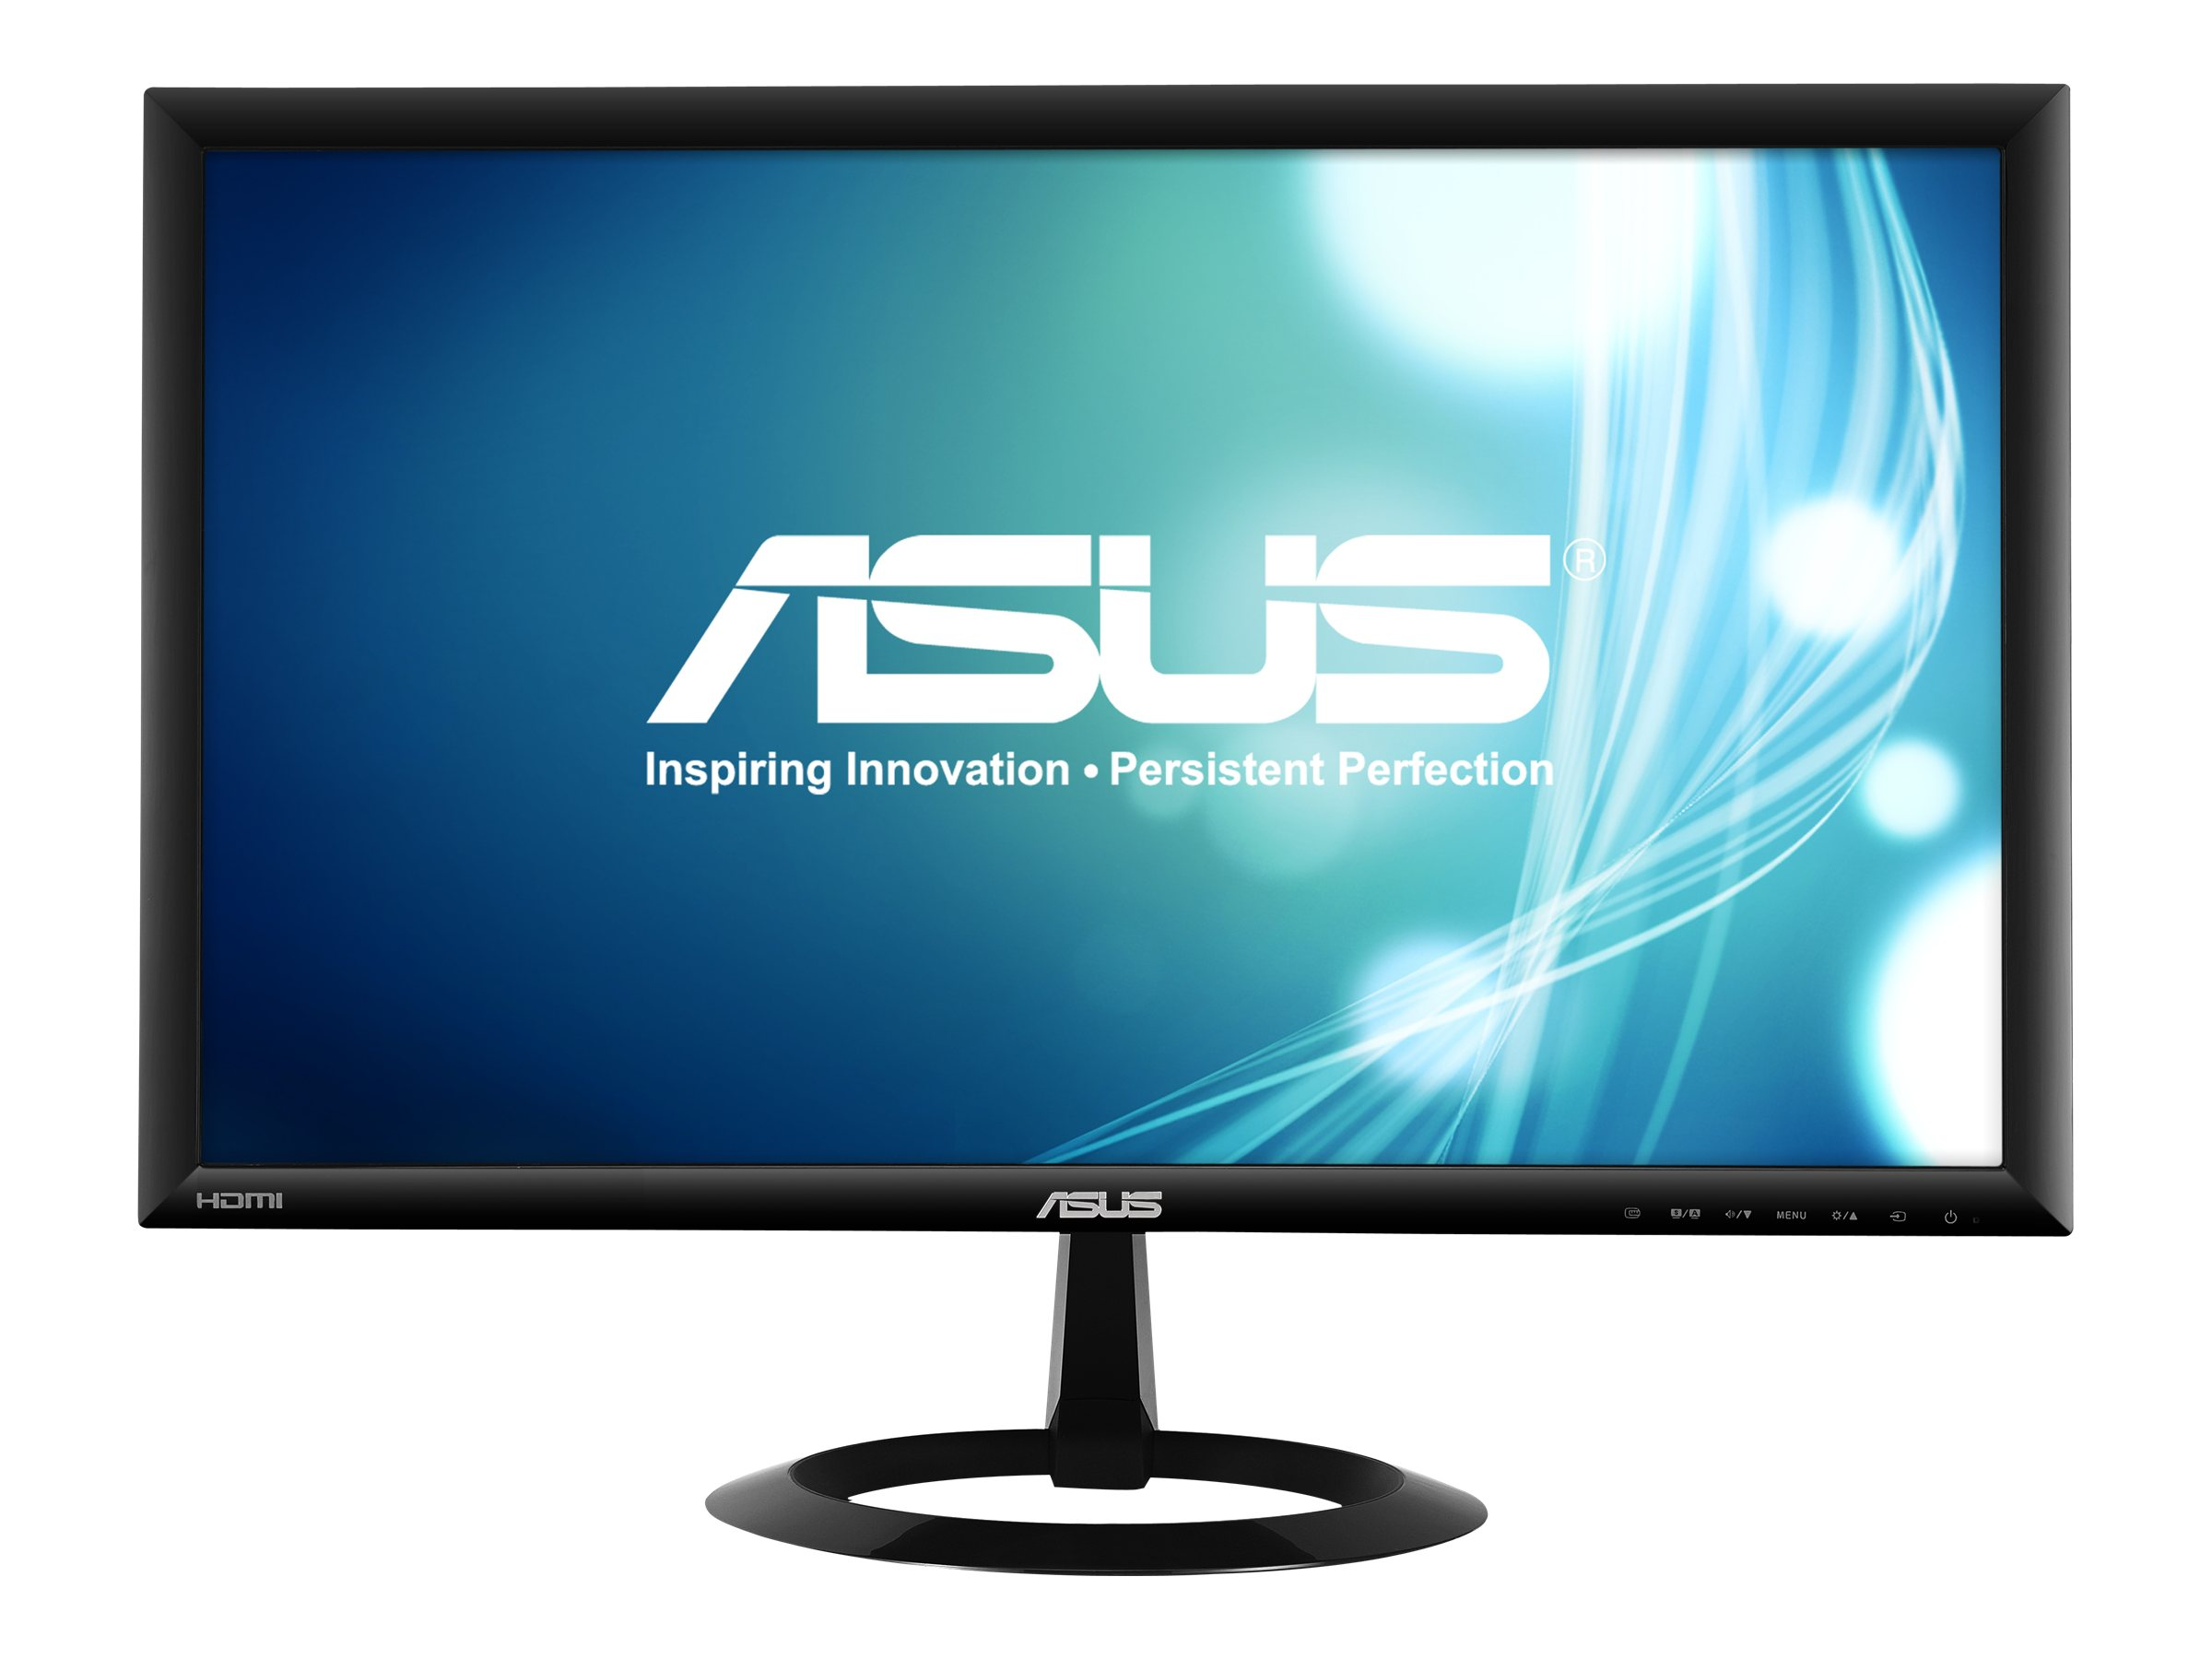 ASUS VX228H - LED-Monitor - 54.6 cm (21.5